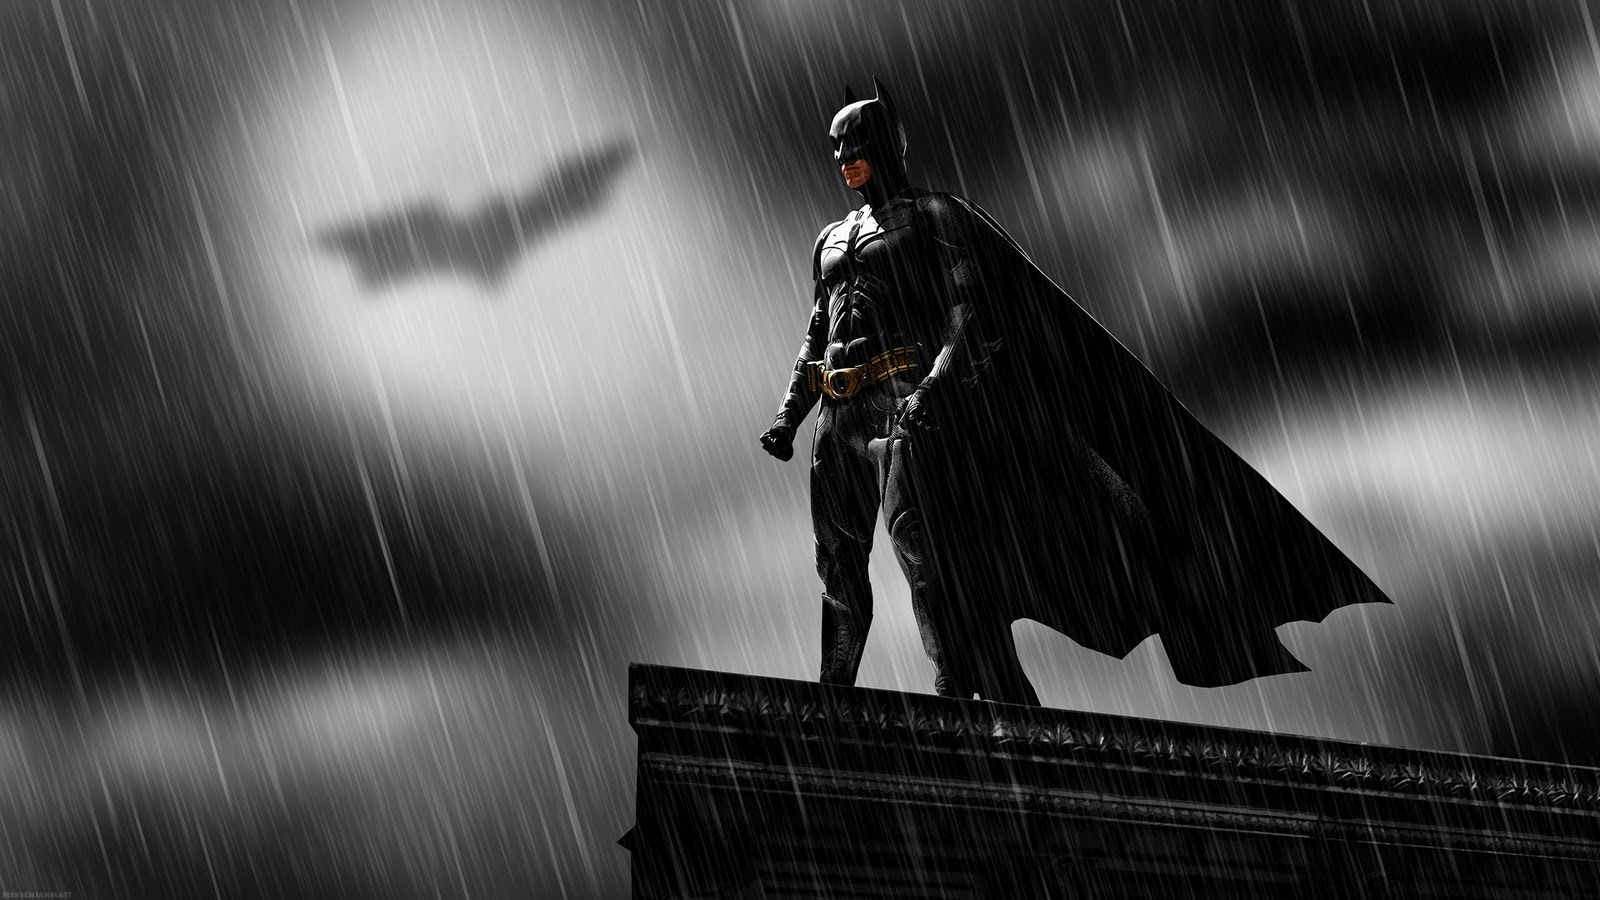 Http Better1 Co صور بات مان باتمان جنن العالم تعال خذ ش Http Better1 Co Batman Wallpaper Batman Backgrounds Batman